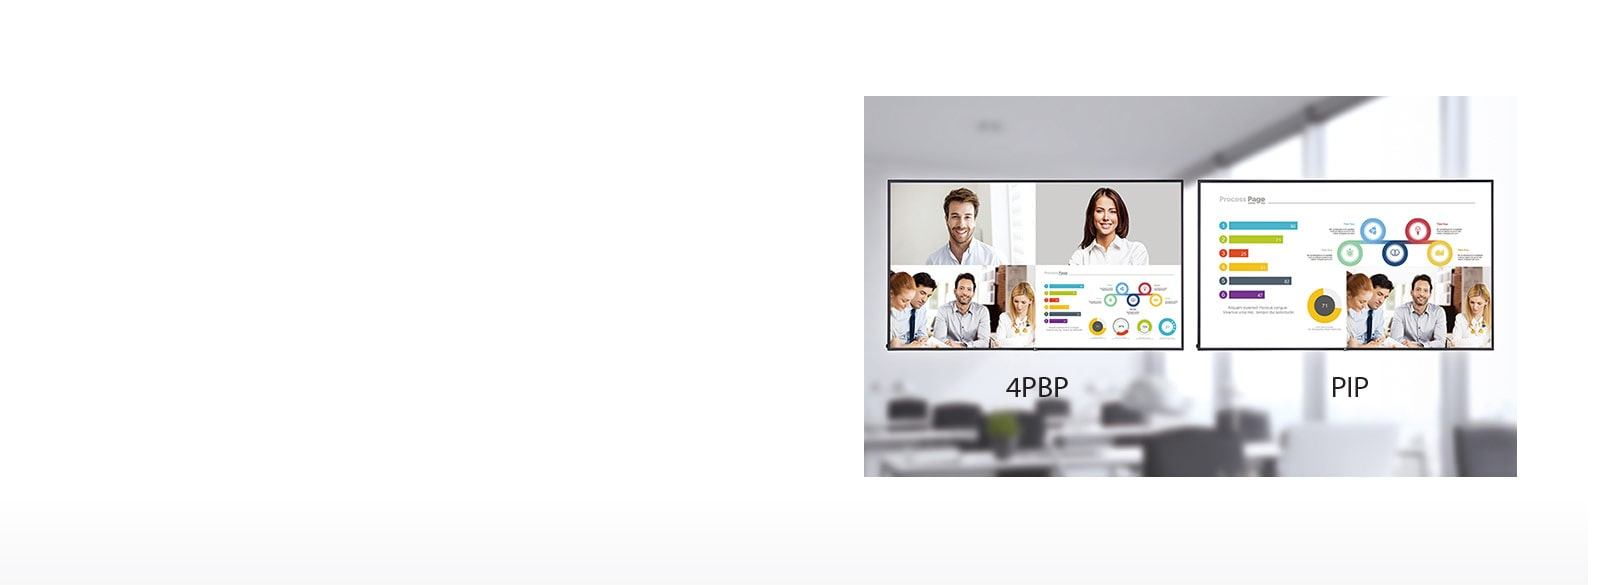 Split Screen with PBP/PIP<br>1